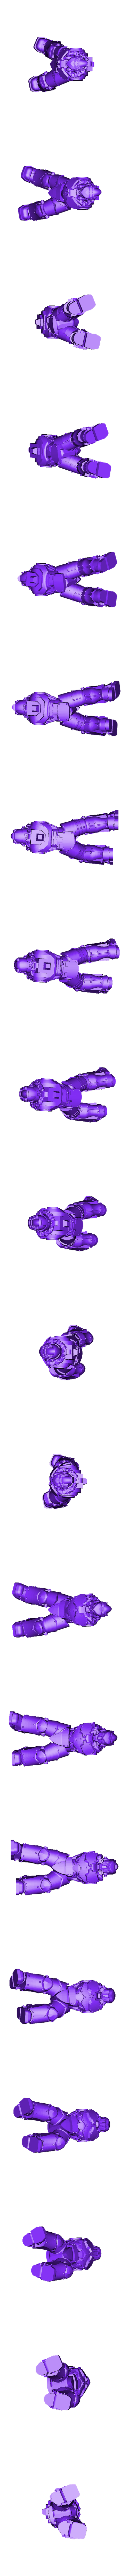 The_Slayer_-_Main_Body.stl Download free STL file The Slayer • 3D print design, GarinC3D